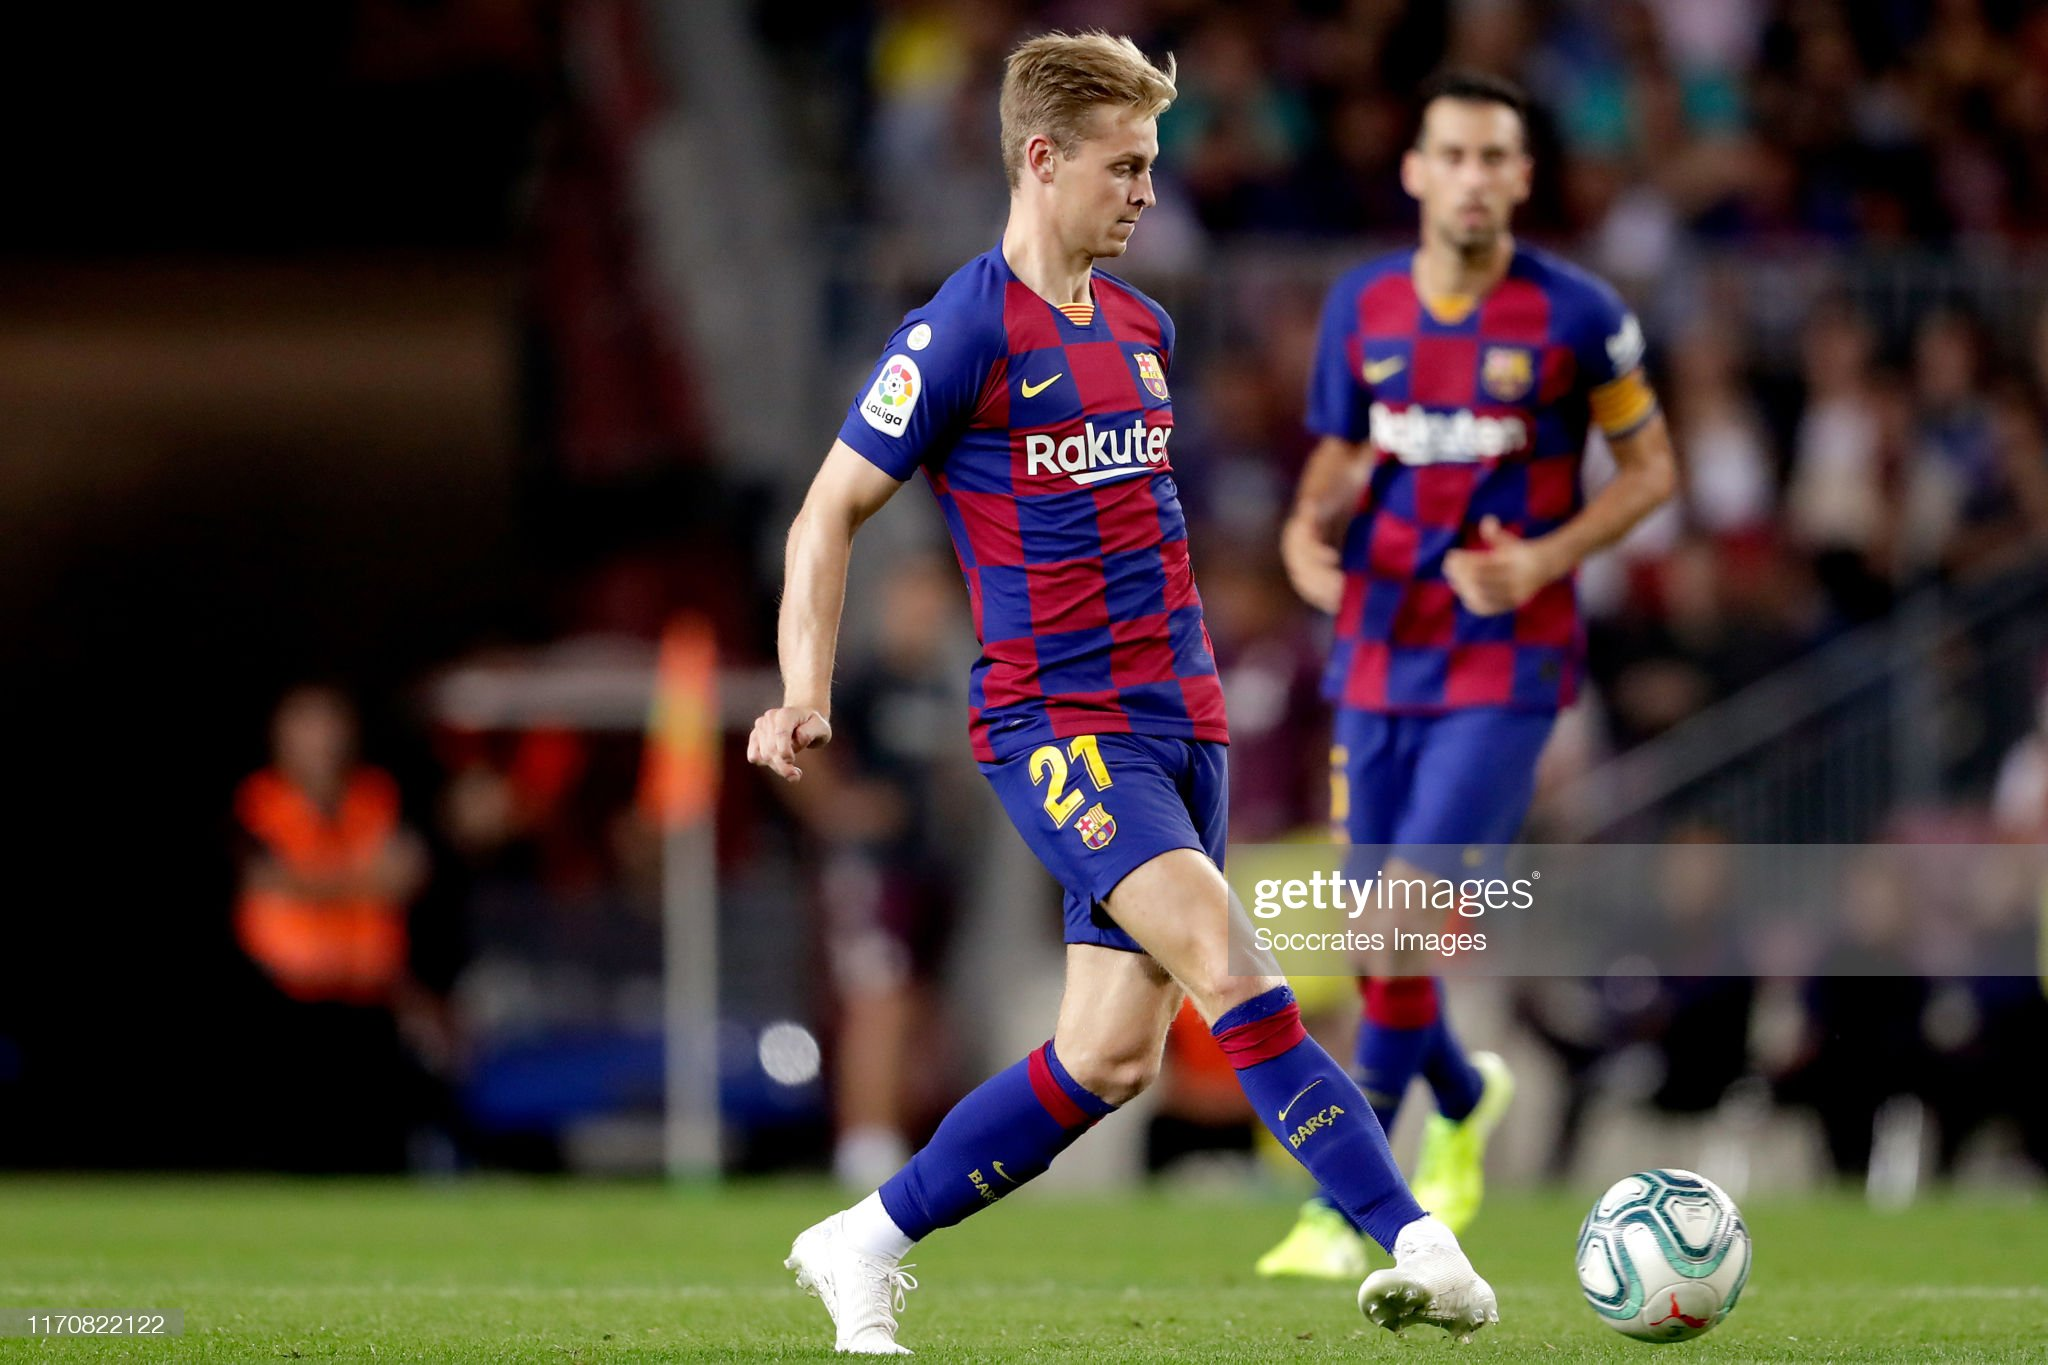 صور مباراة : برشلونة - فياريال 2-1 ( 24-09-2019 )  Frenkie-de-jong-of-fc-barcelona-during-the-la-liga-santander-match-picture-id1170822122?s=2048x2048